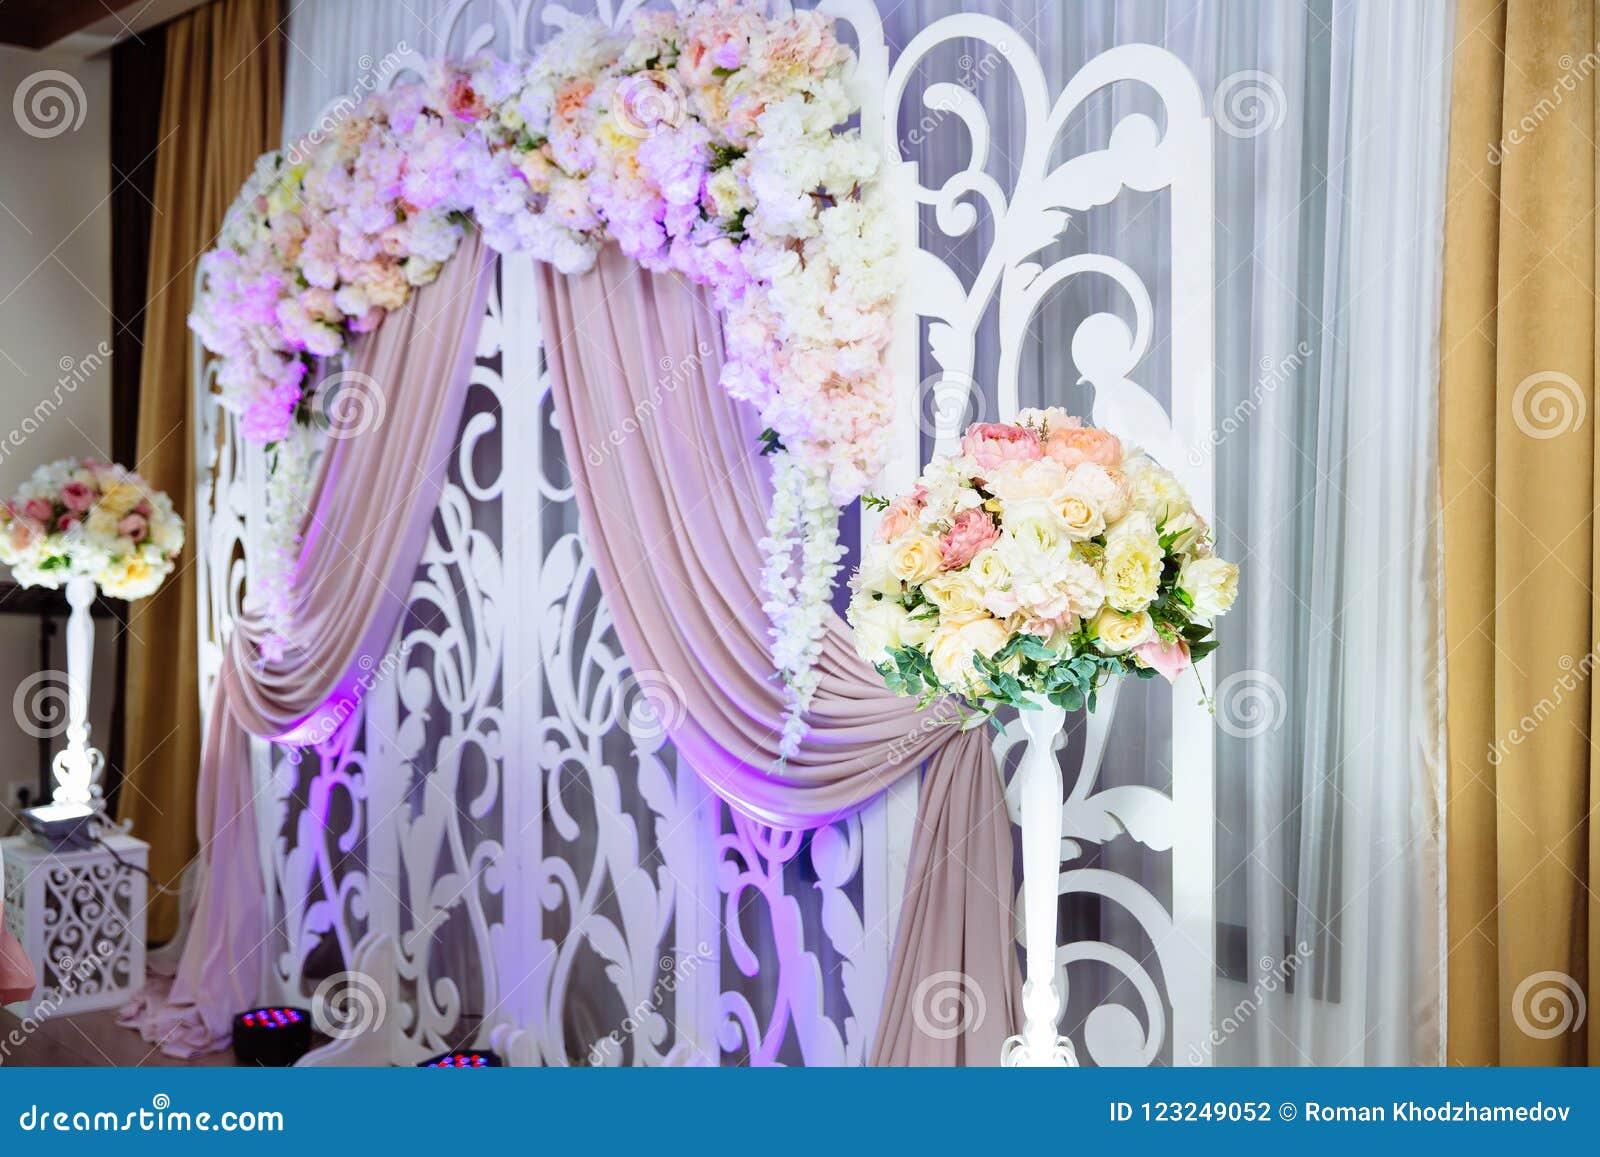 Wedding Decorations Wedding Arch Decoration Ideas For Decorating A